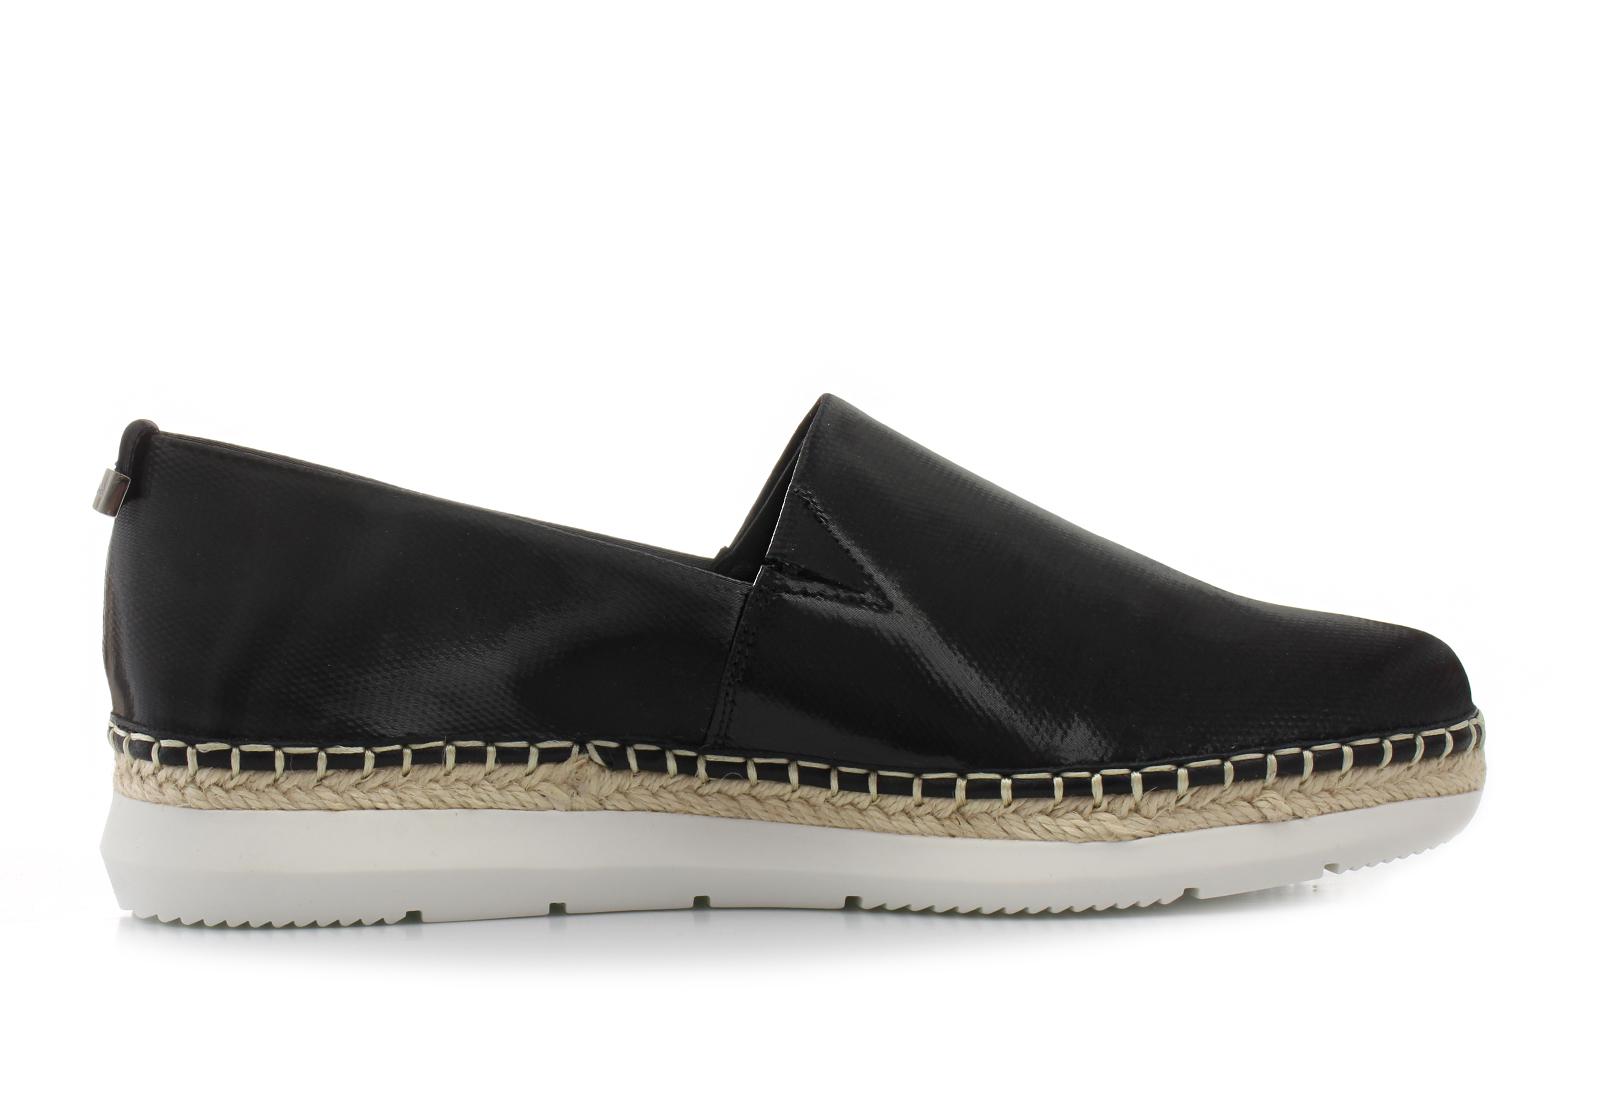 Calvin Klein Black Label Cipő - Vrinda - E6573-BLK - Office Shoes ... 6ad51f8113